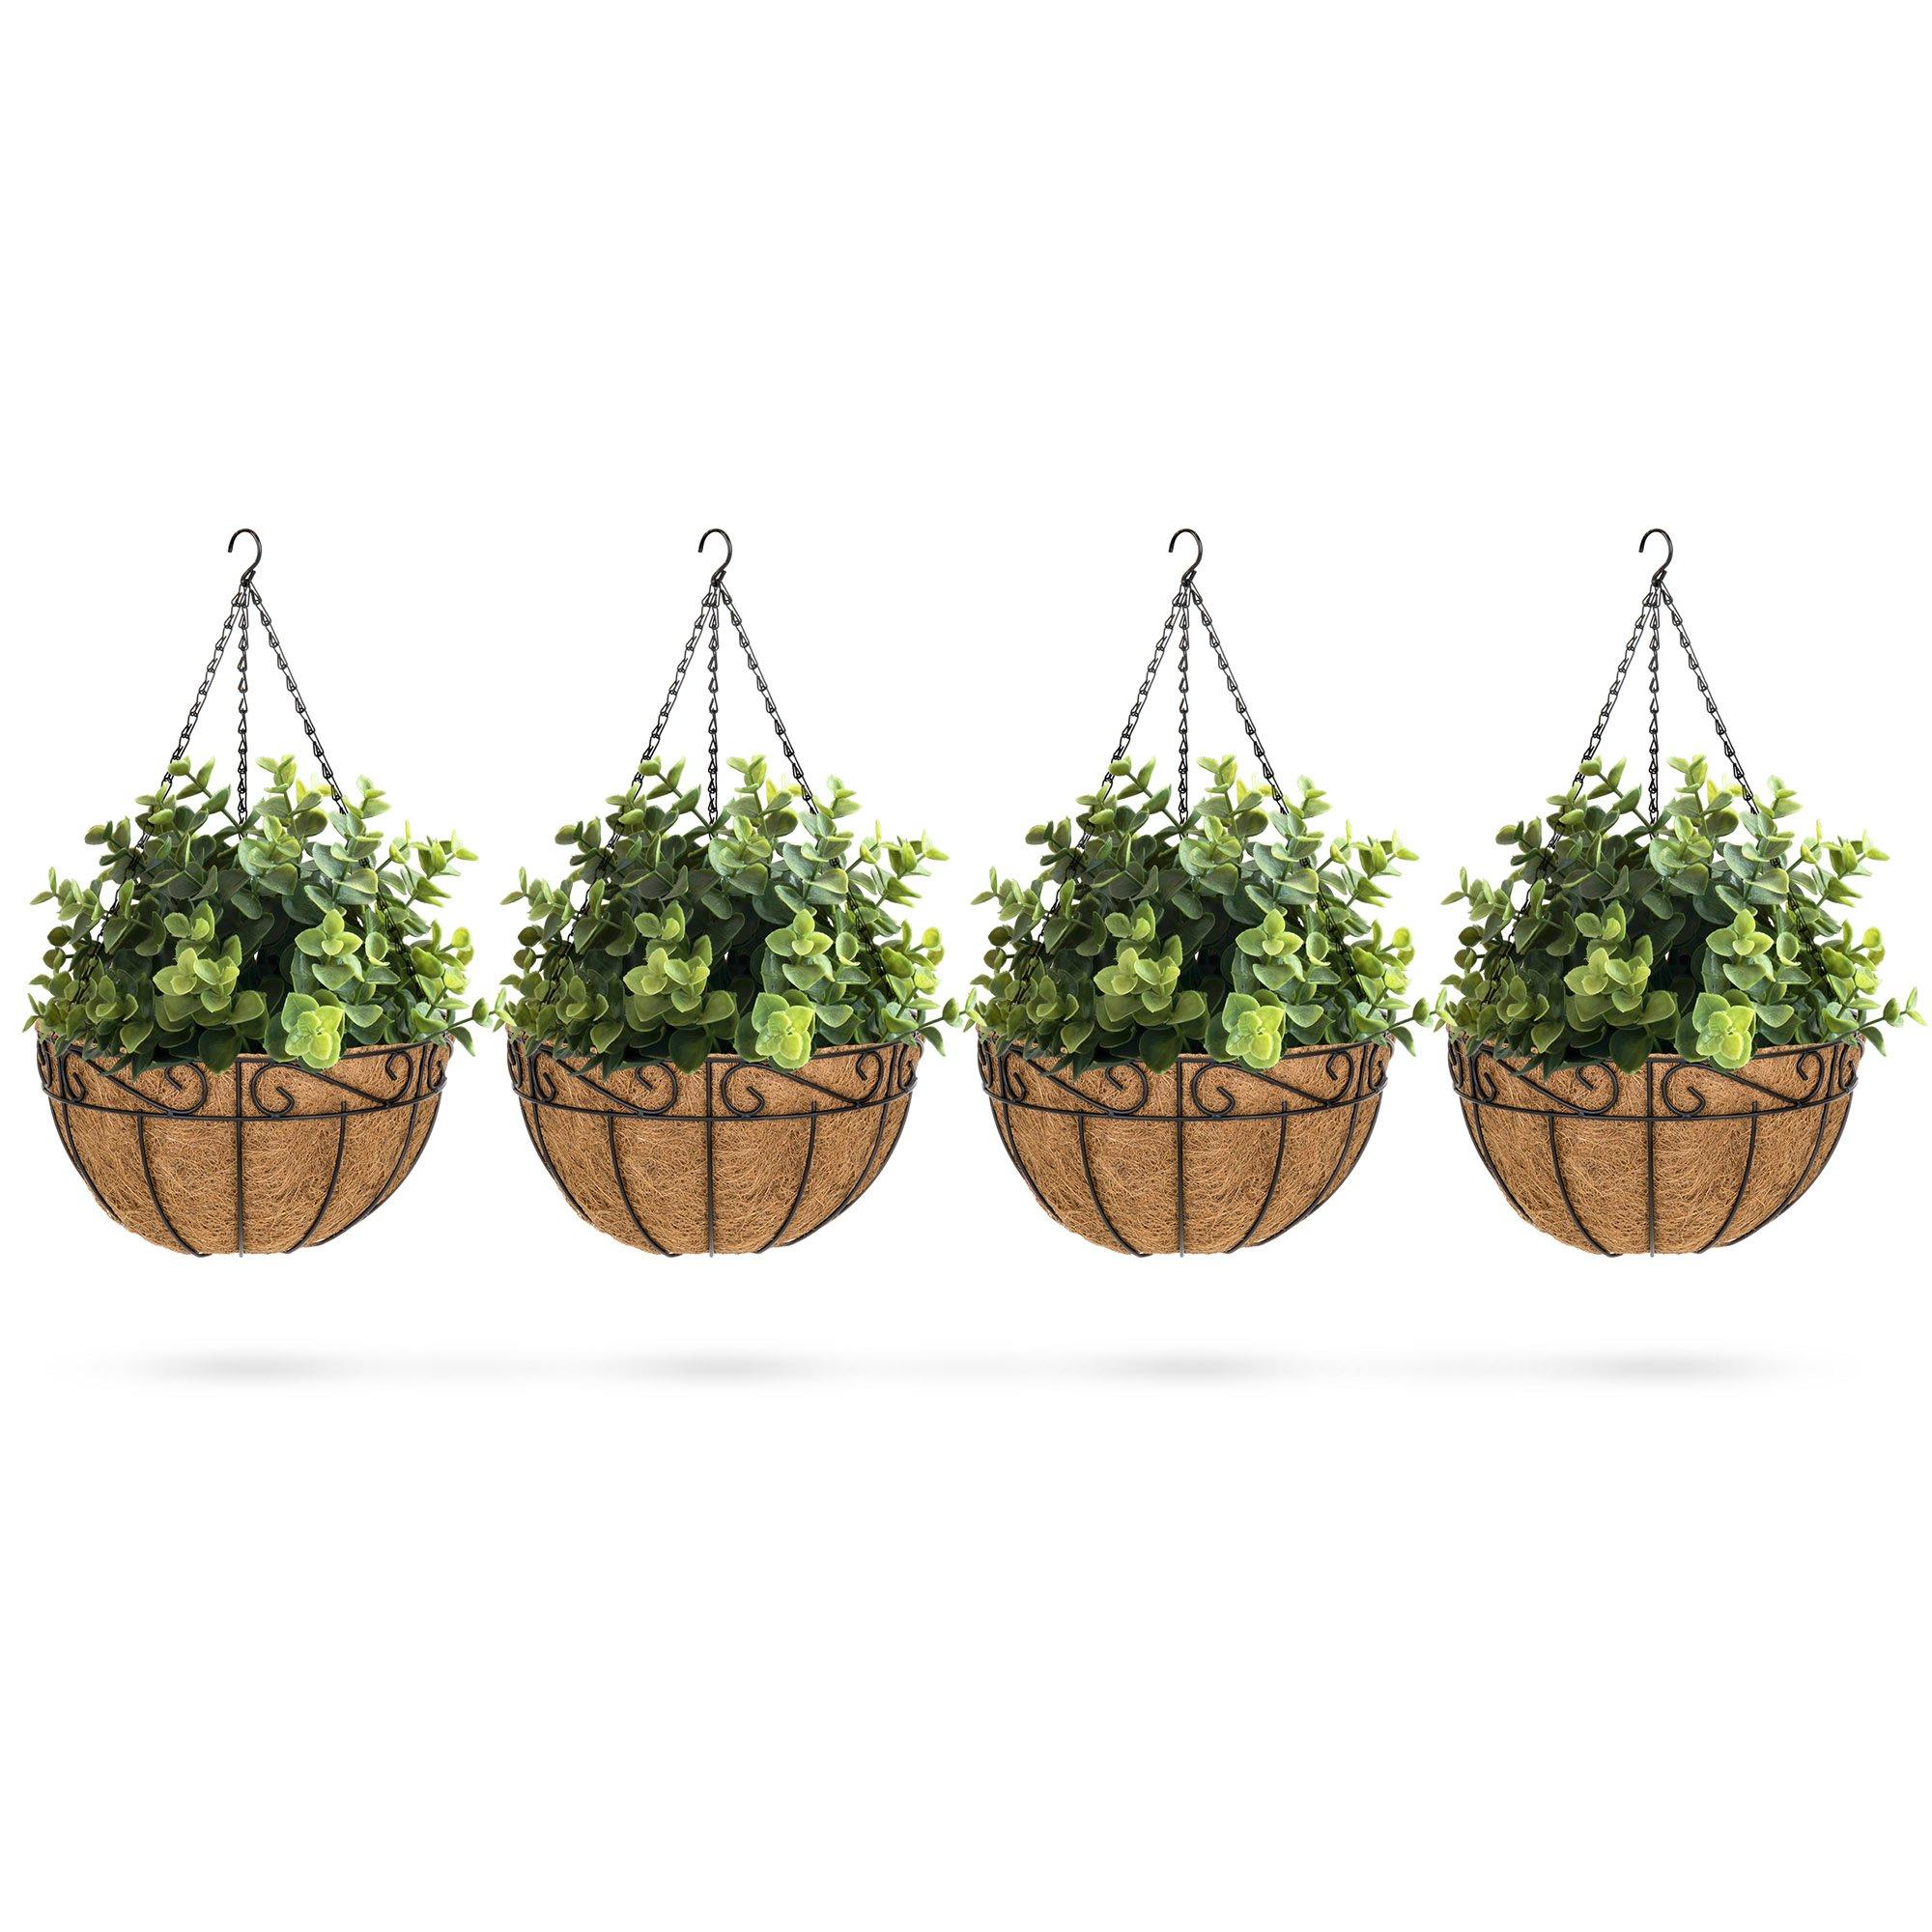 Best Choice Products Set of 4 Decorative Metal Hanging Basket Garden Flower Planters w/Coconut Liner, Hook - Black